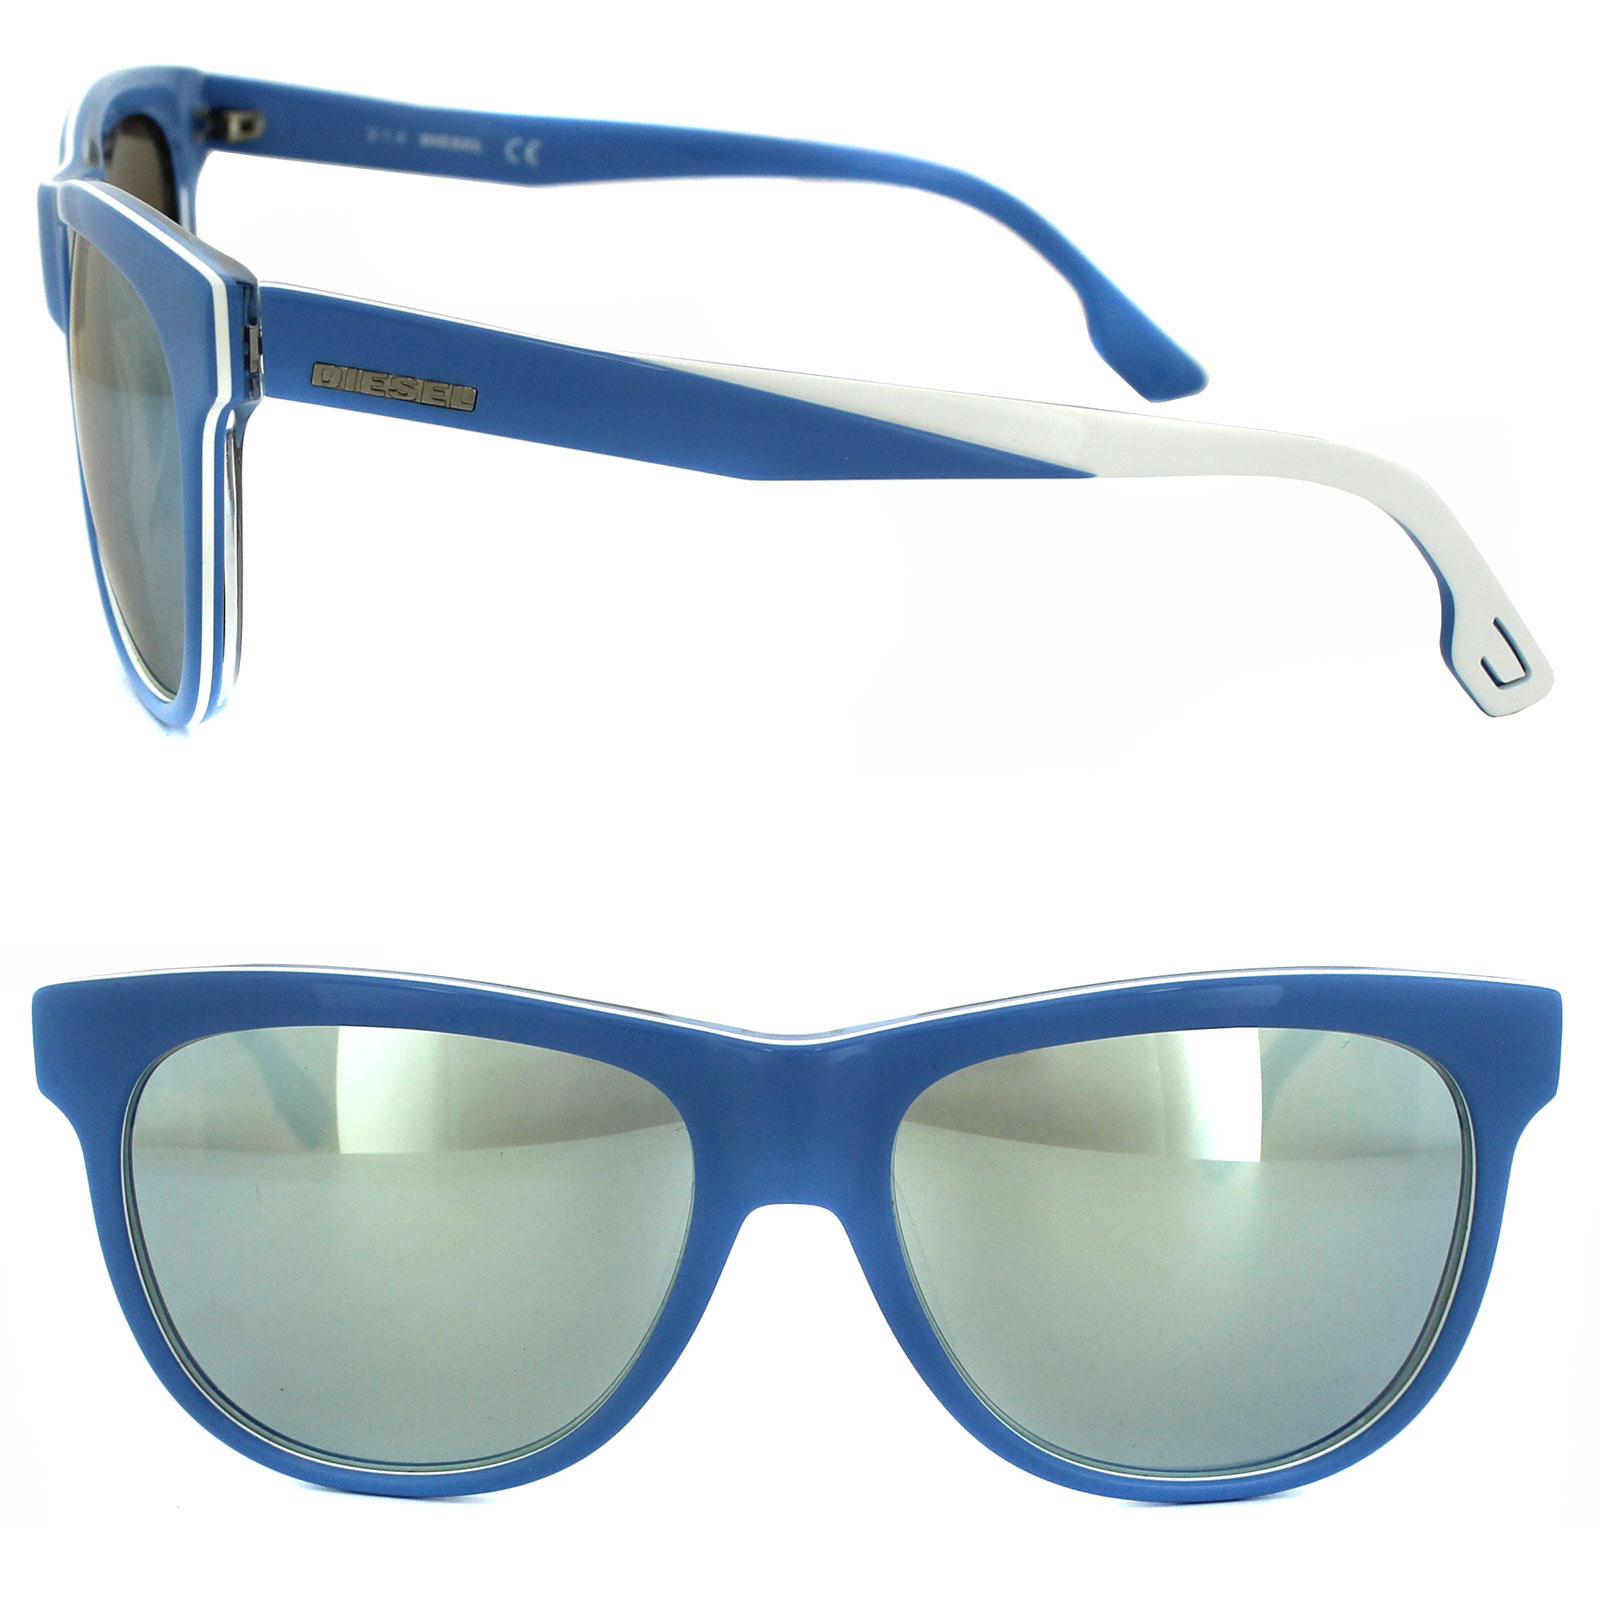 910e075689 Sentinel Diesel Sunglasses DL0112 86C Blue   White Grey Mirror